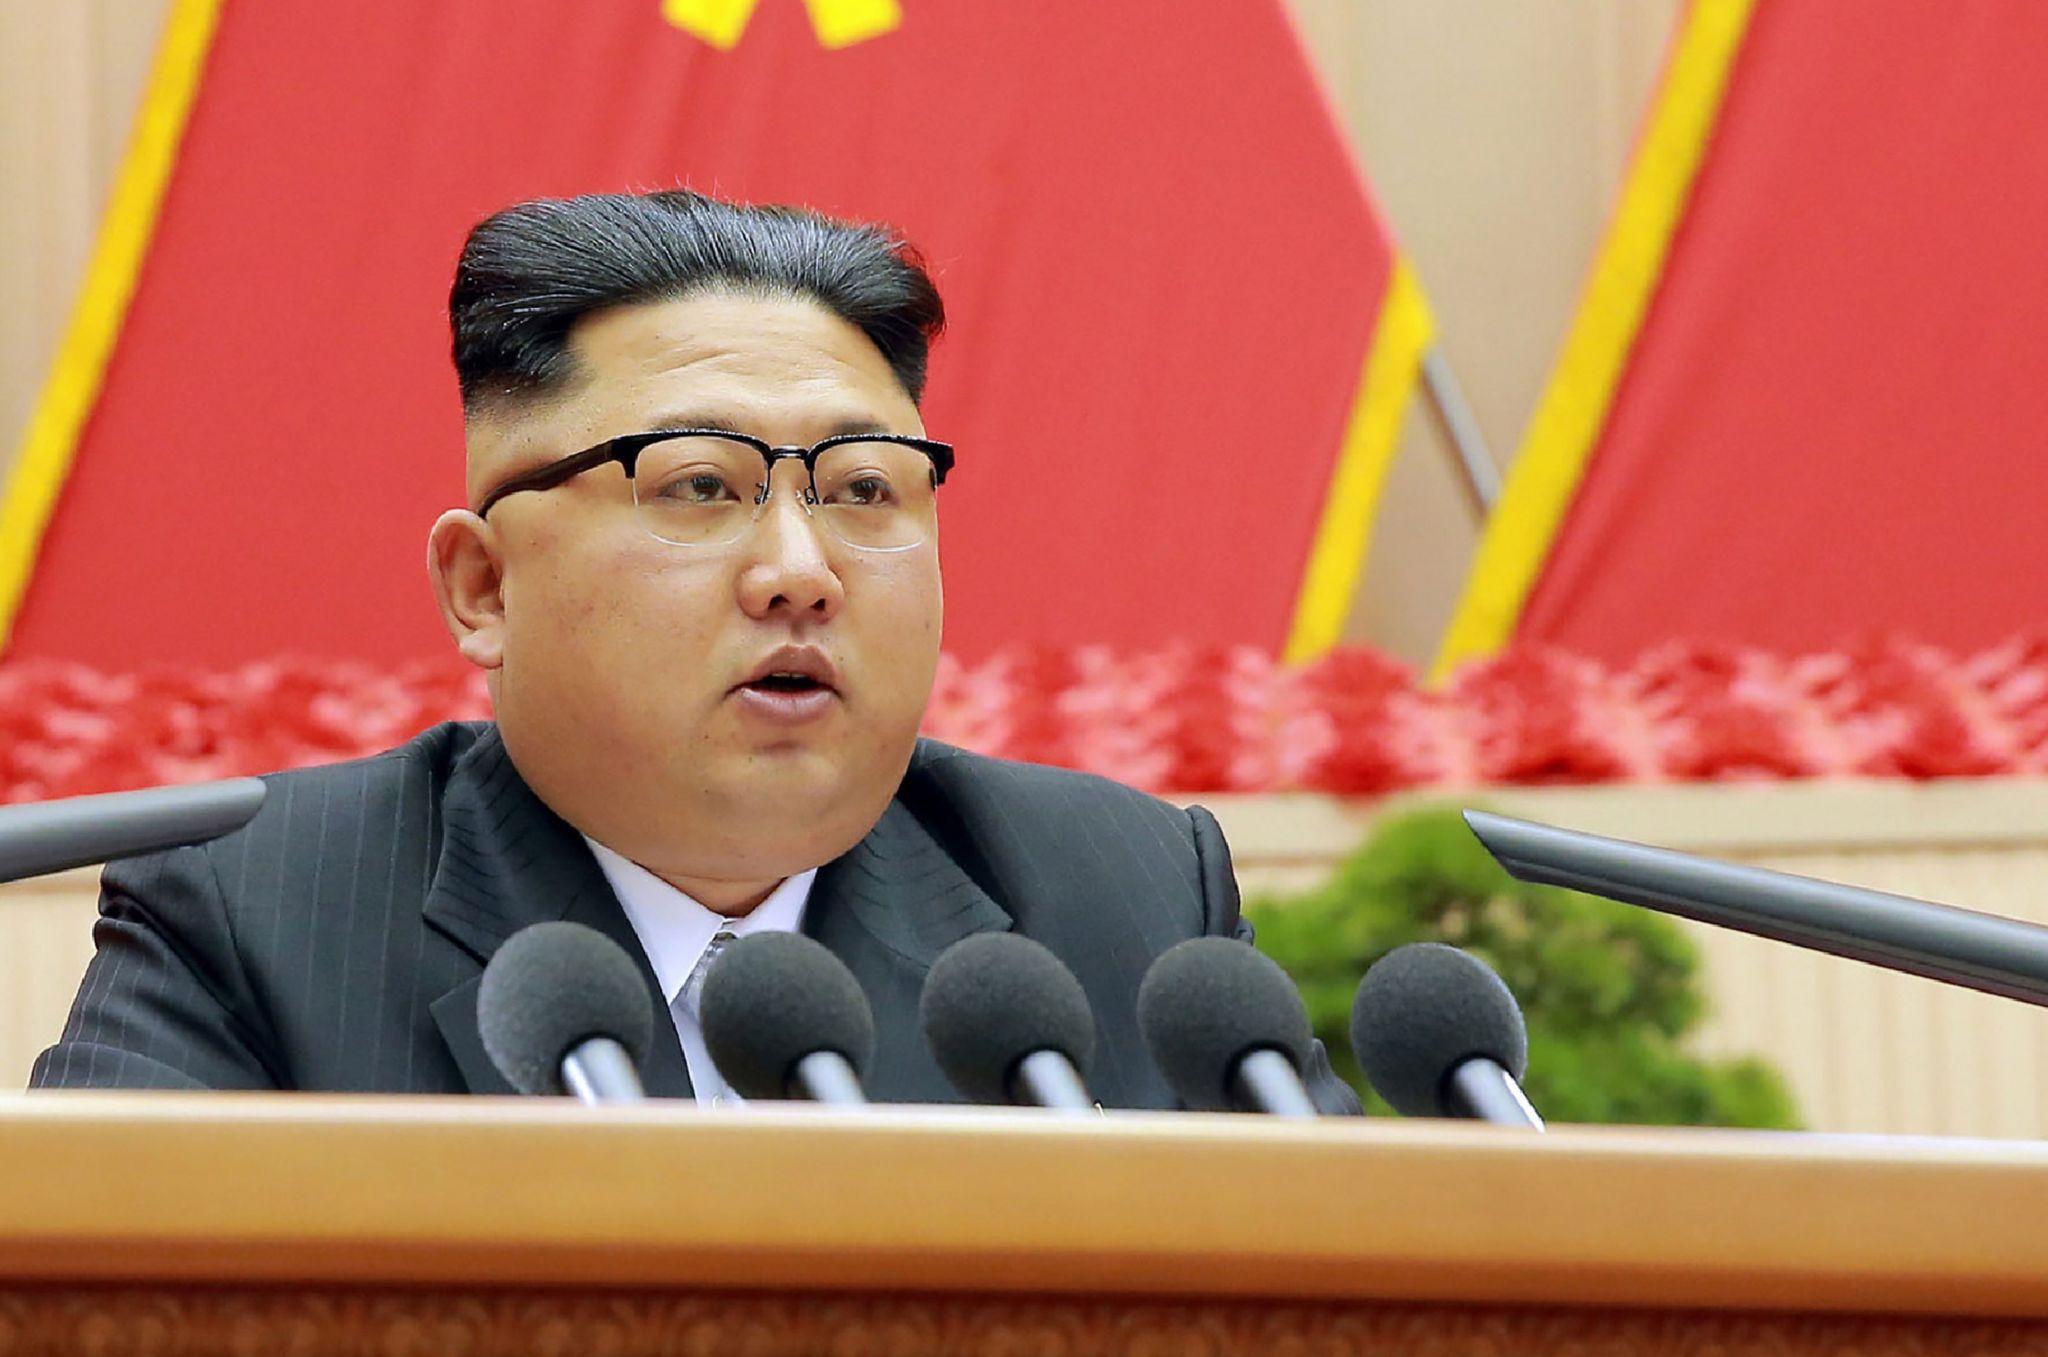 North Korean leader Kim Jong-un. File photo